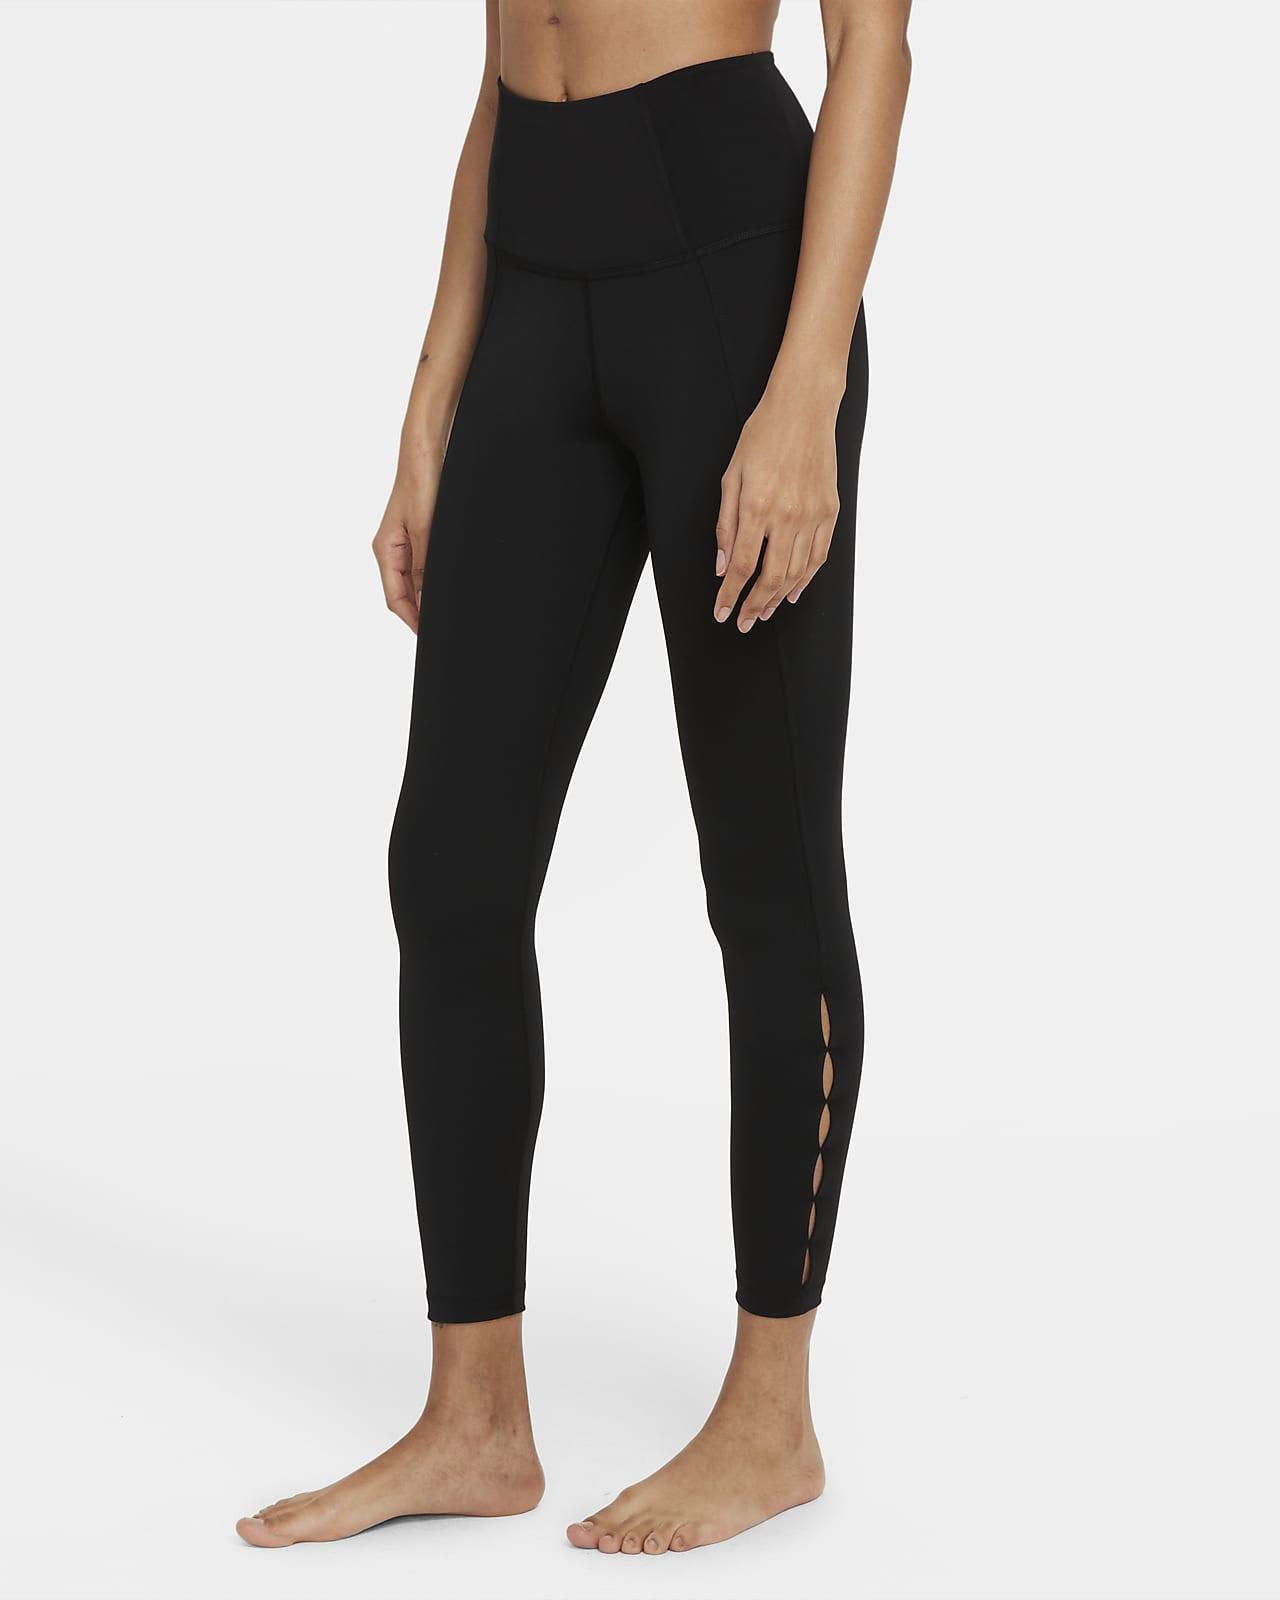 Leggings recortados de cintura alta de 7/8 para mujer Nike Yoga Dri-FIT